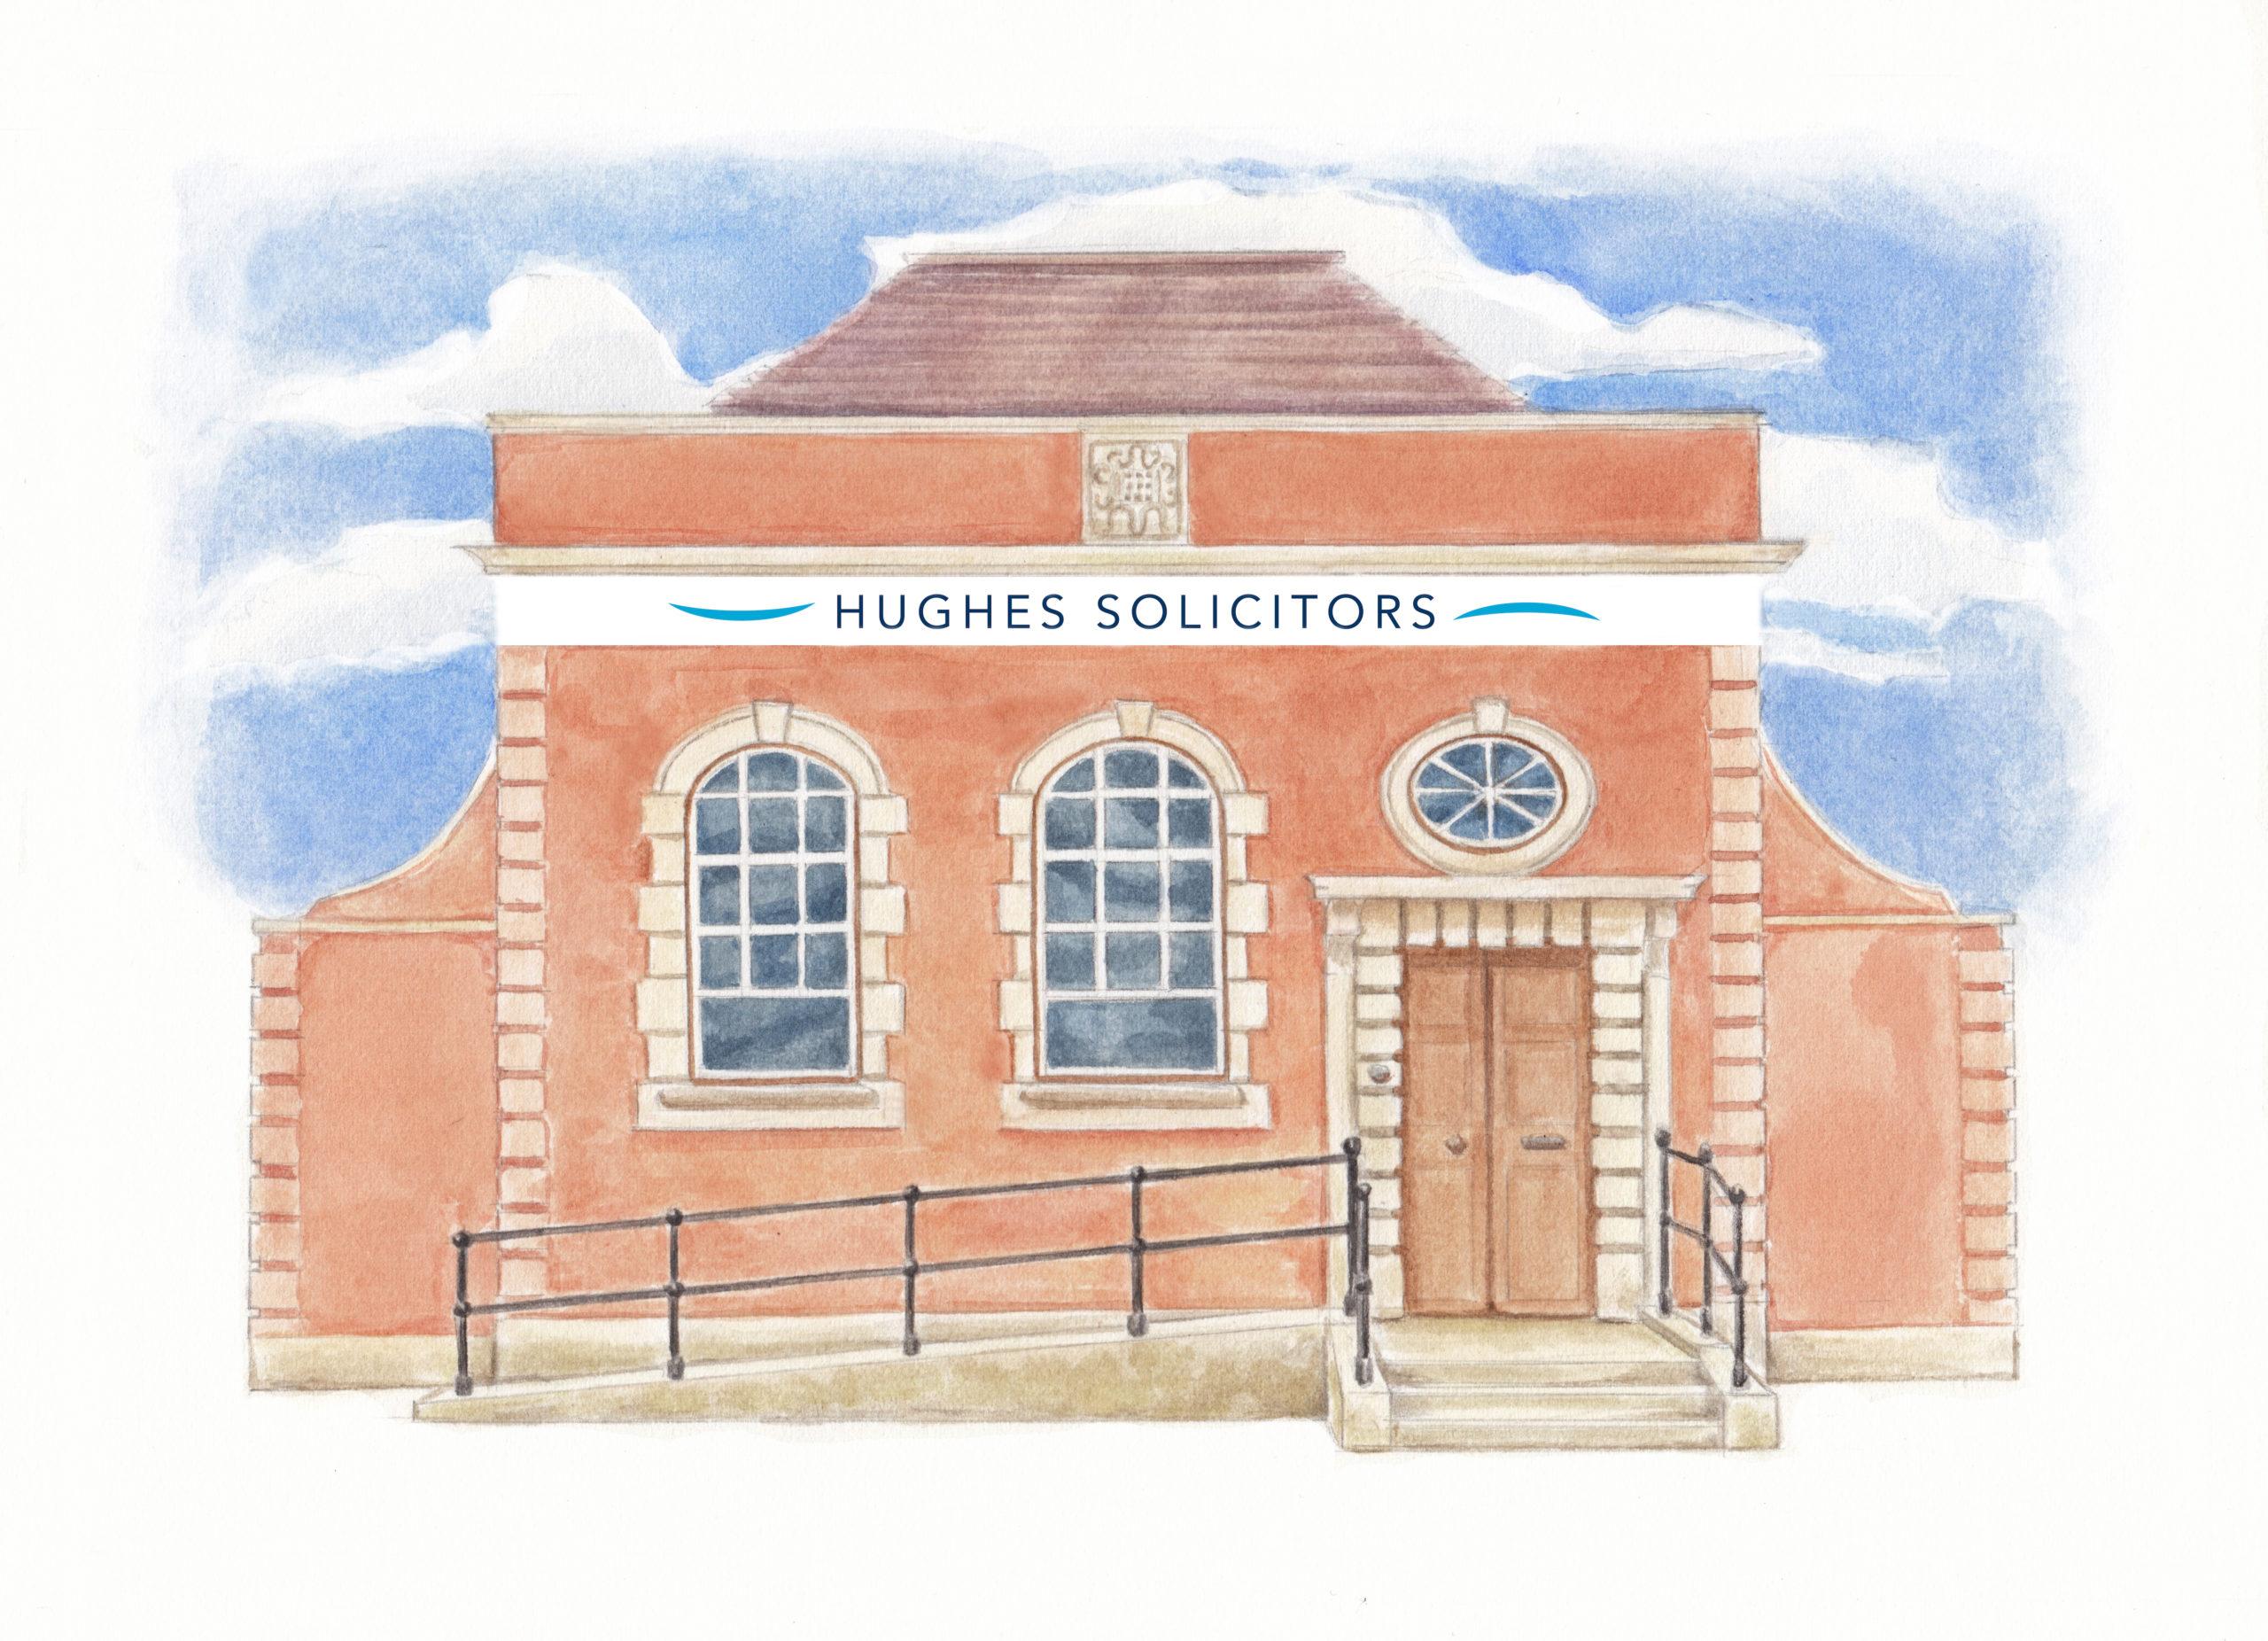 Hughes Solicitors in Heathfield East Sussex